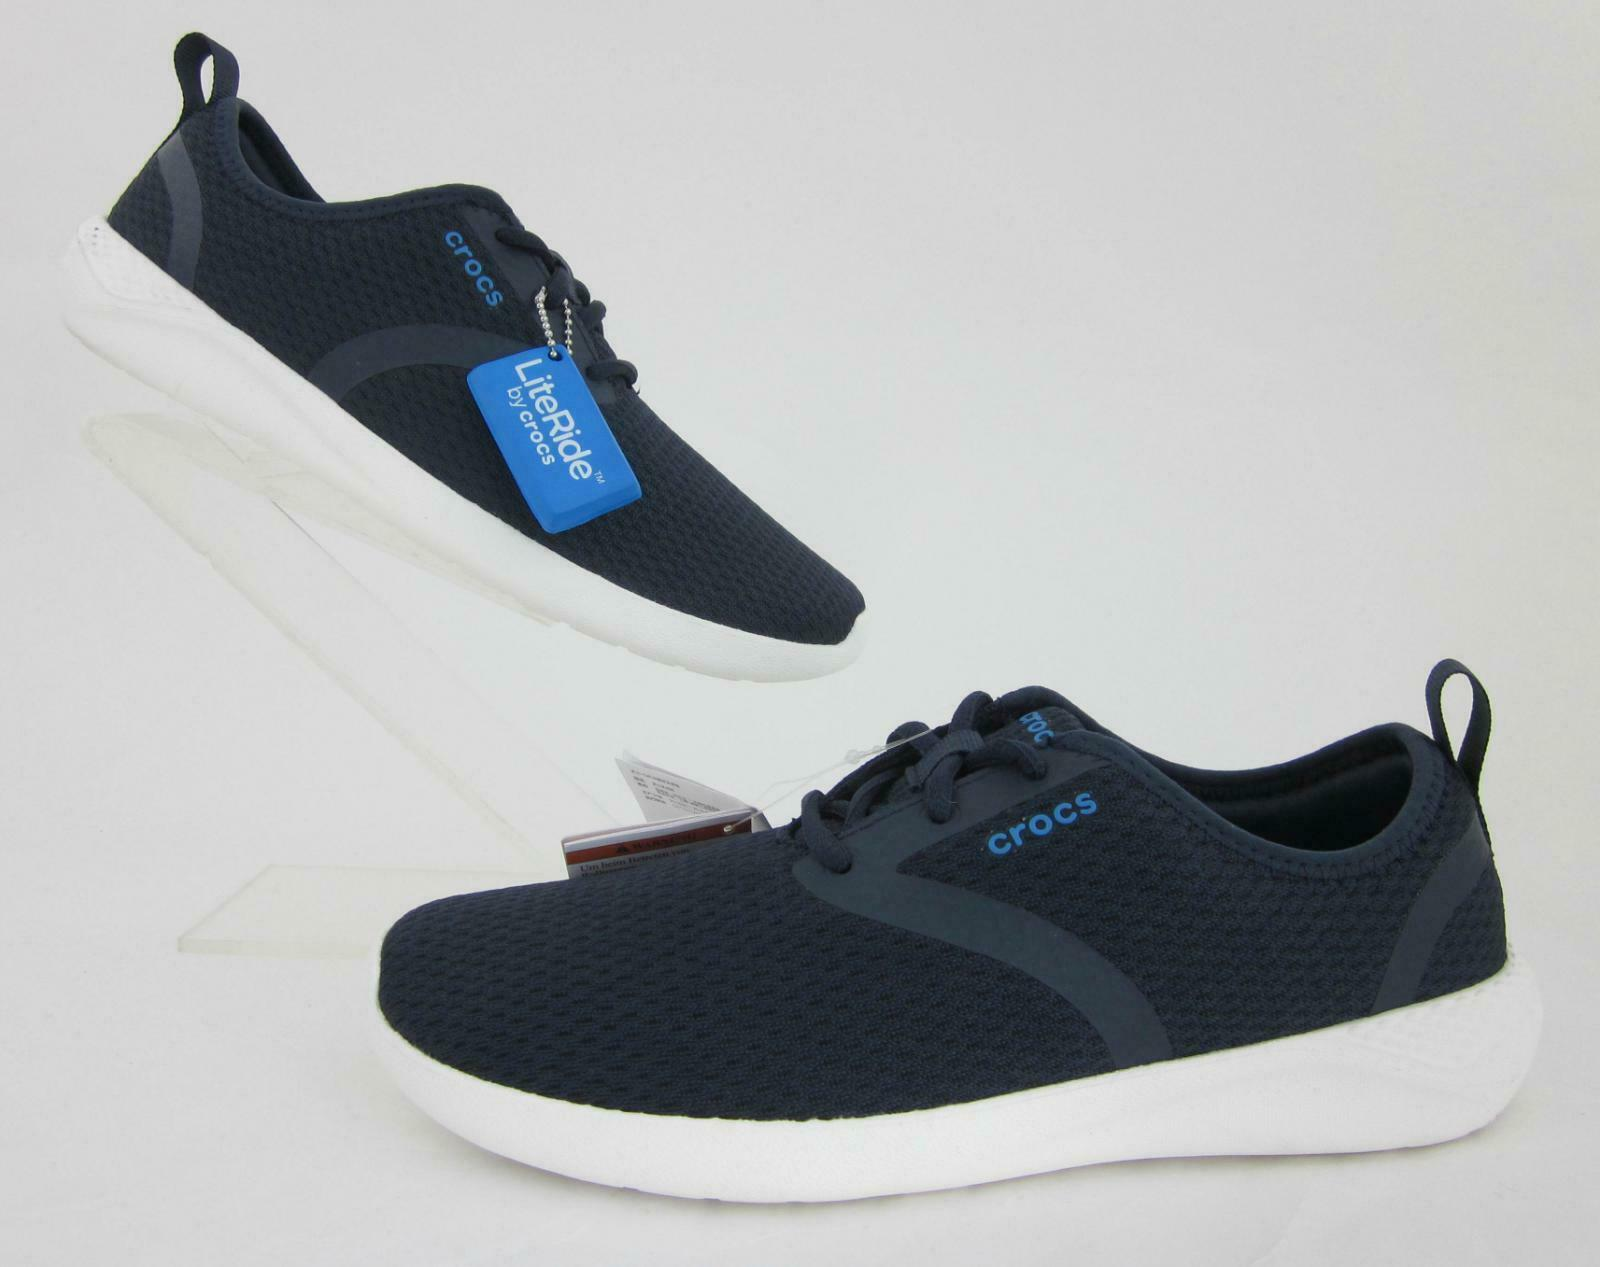 *NEW!* Crocs 'LiteRide Mesh Lace' Mens Sneakers Navy / White